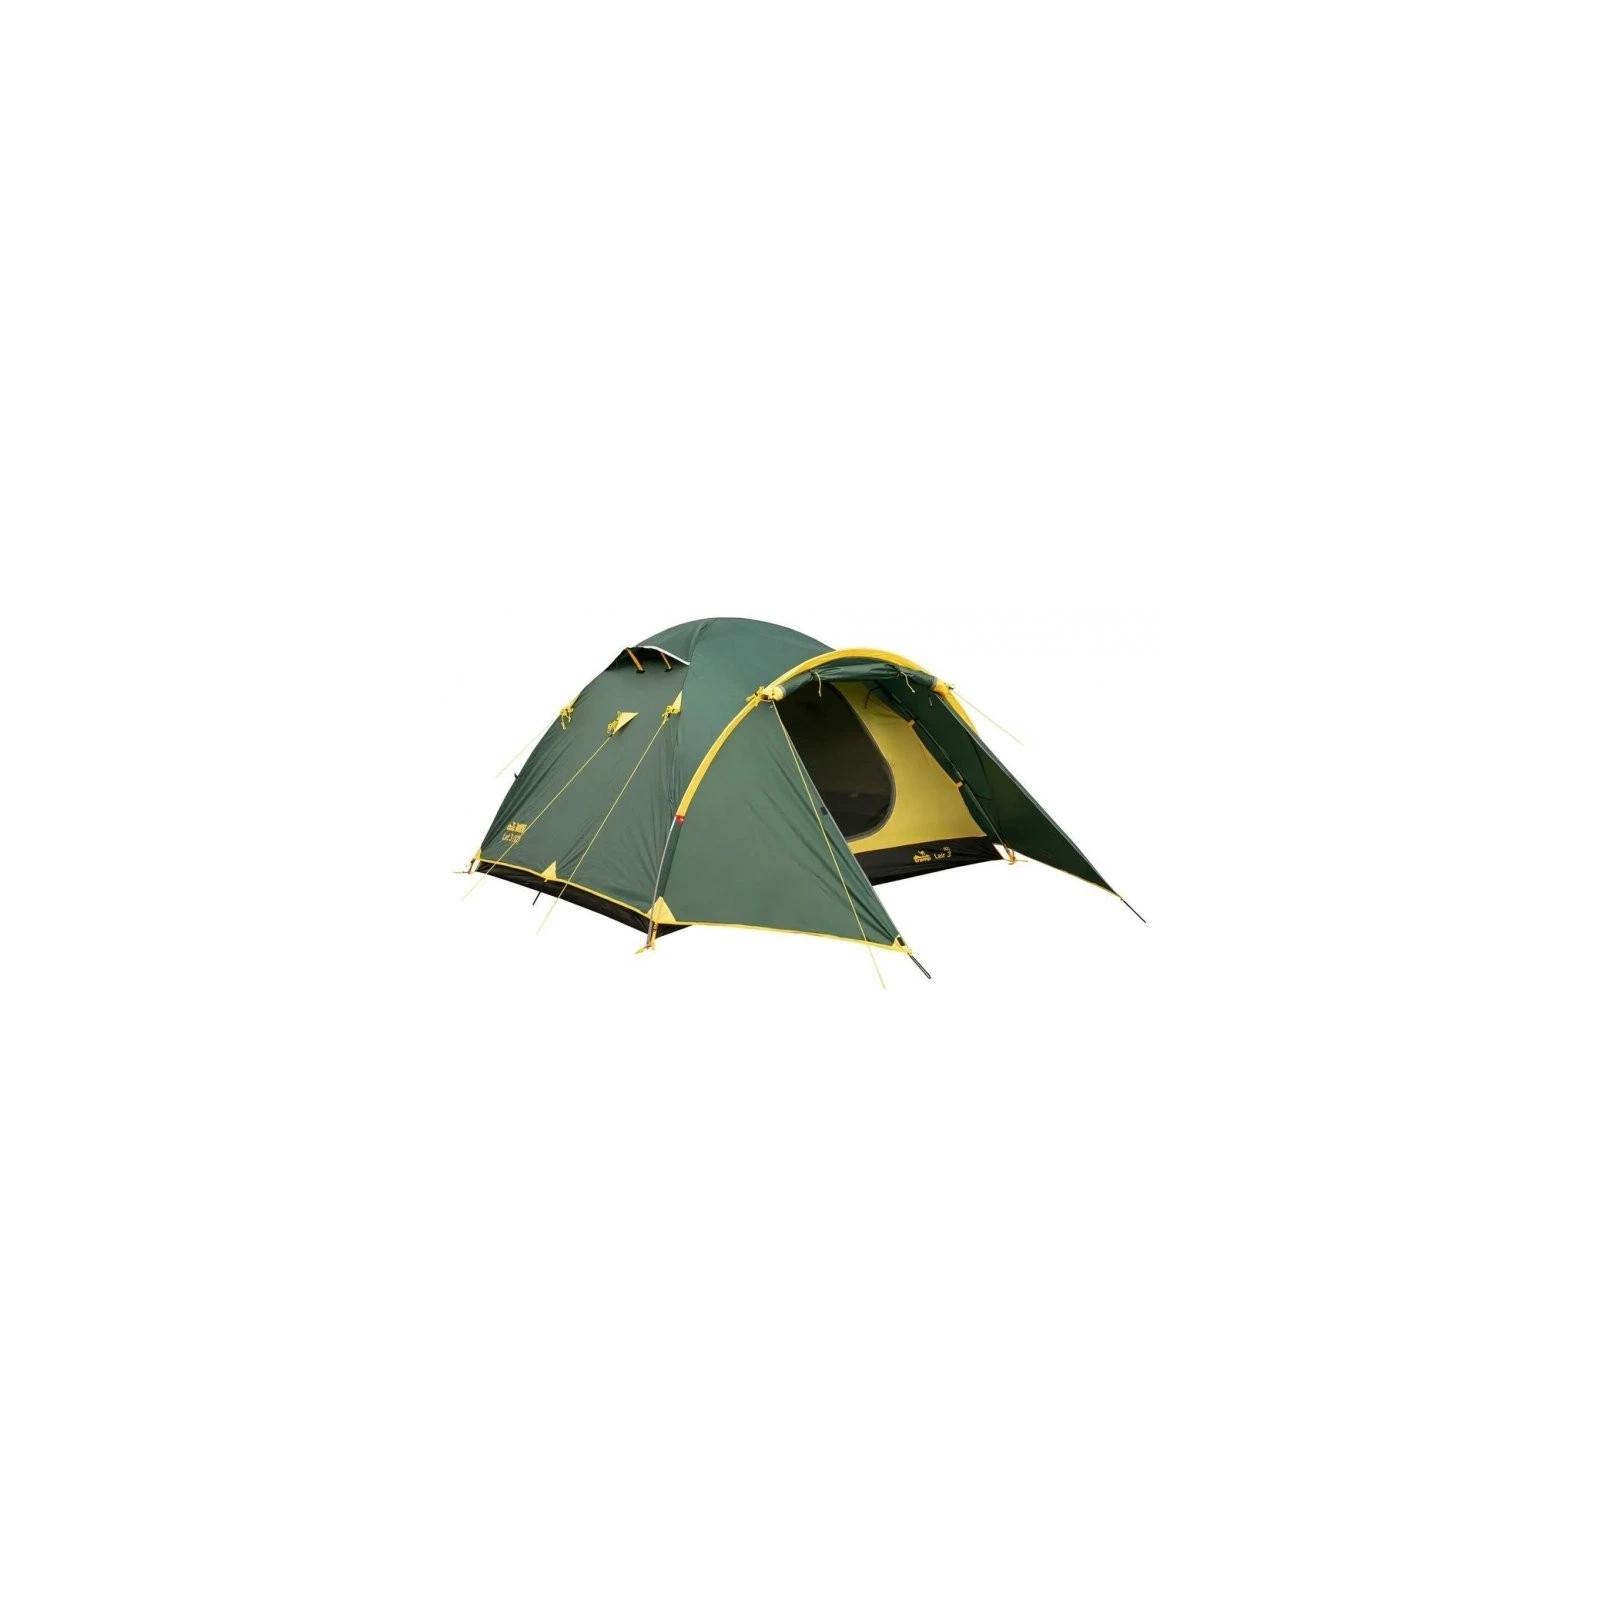 Палатка Tramp Lair 3 v2 (TRT-039)